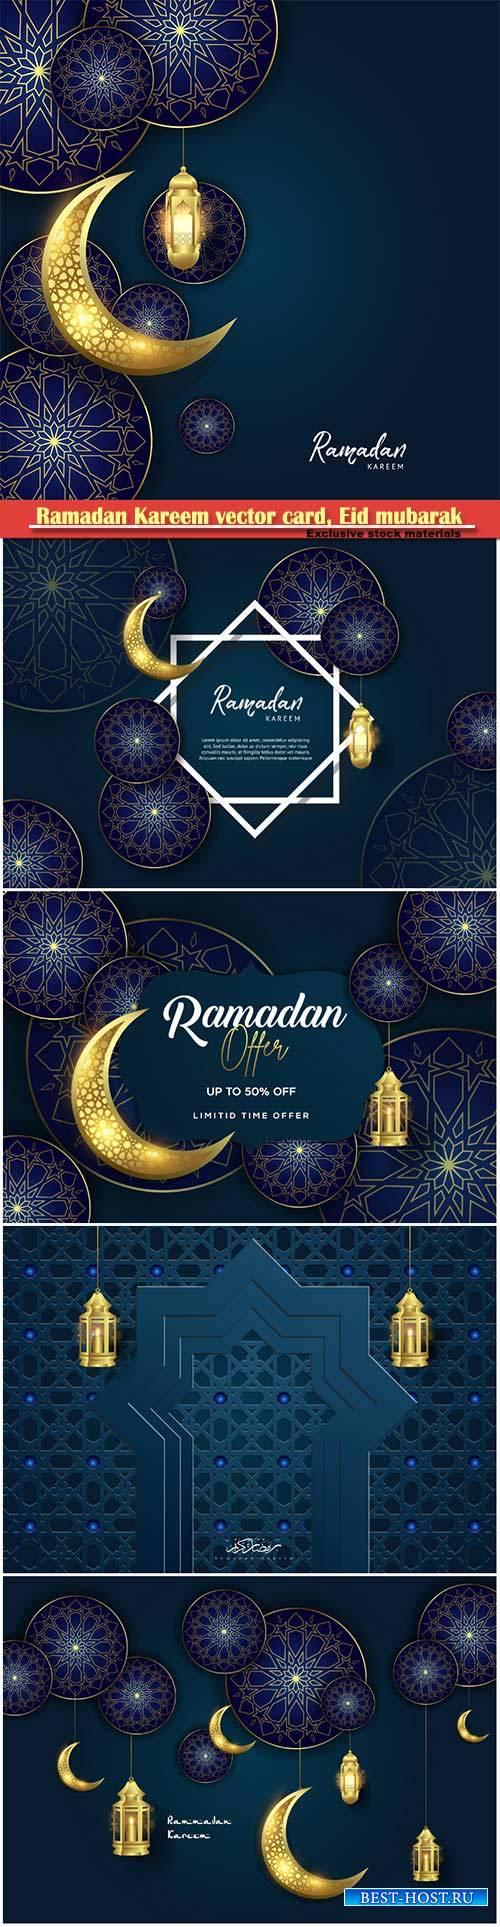 Ramadan Kareem vector card, Eid mubarak calligraphy design templates # 13